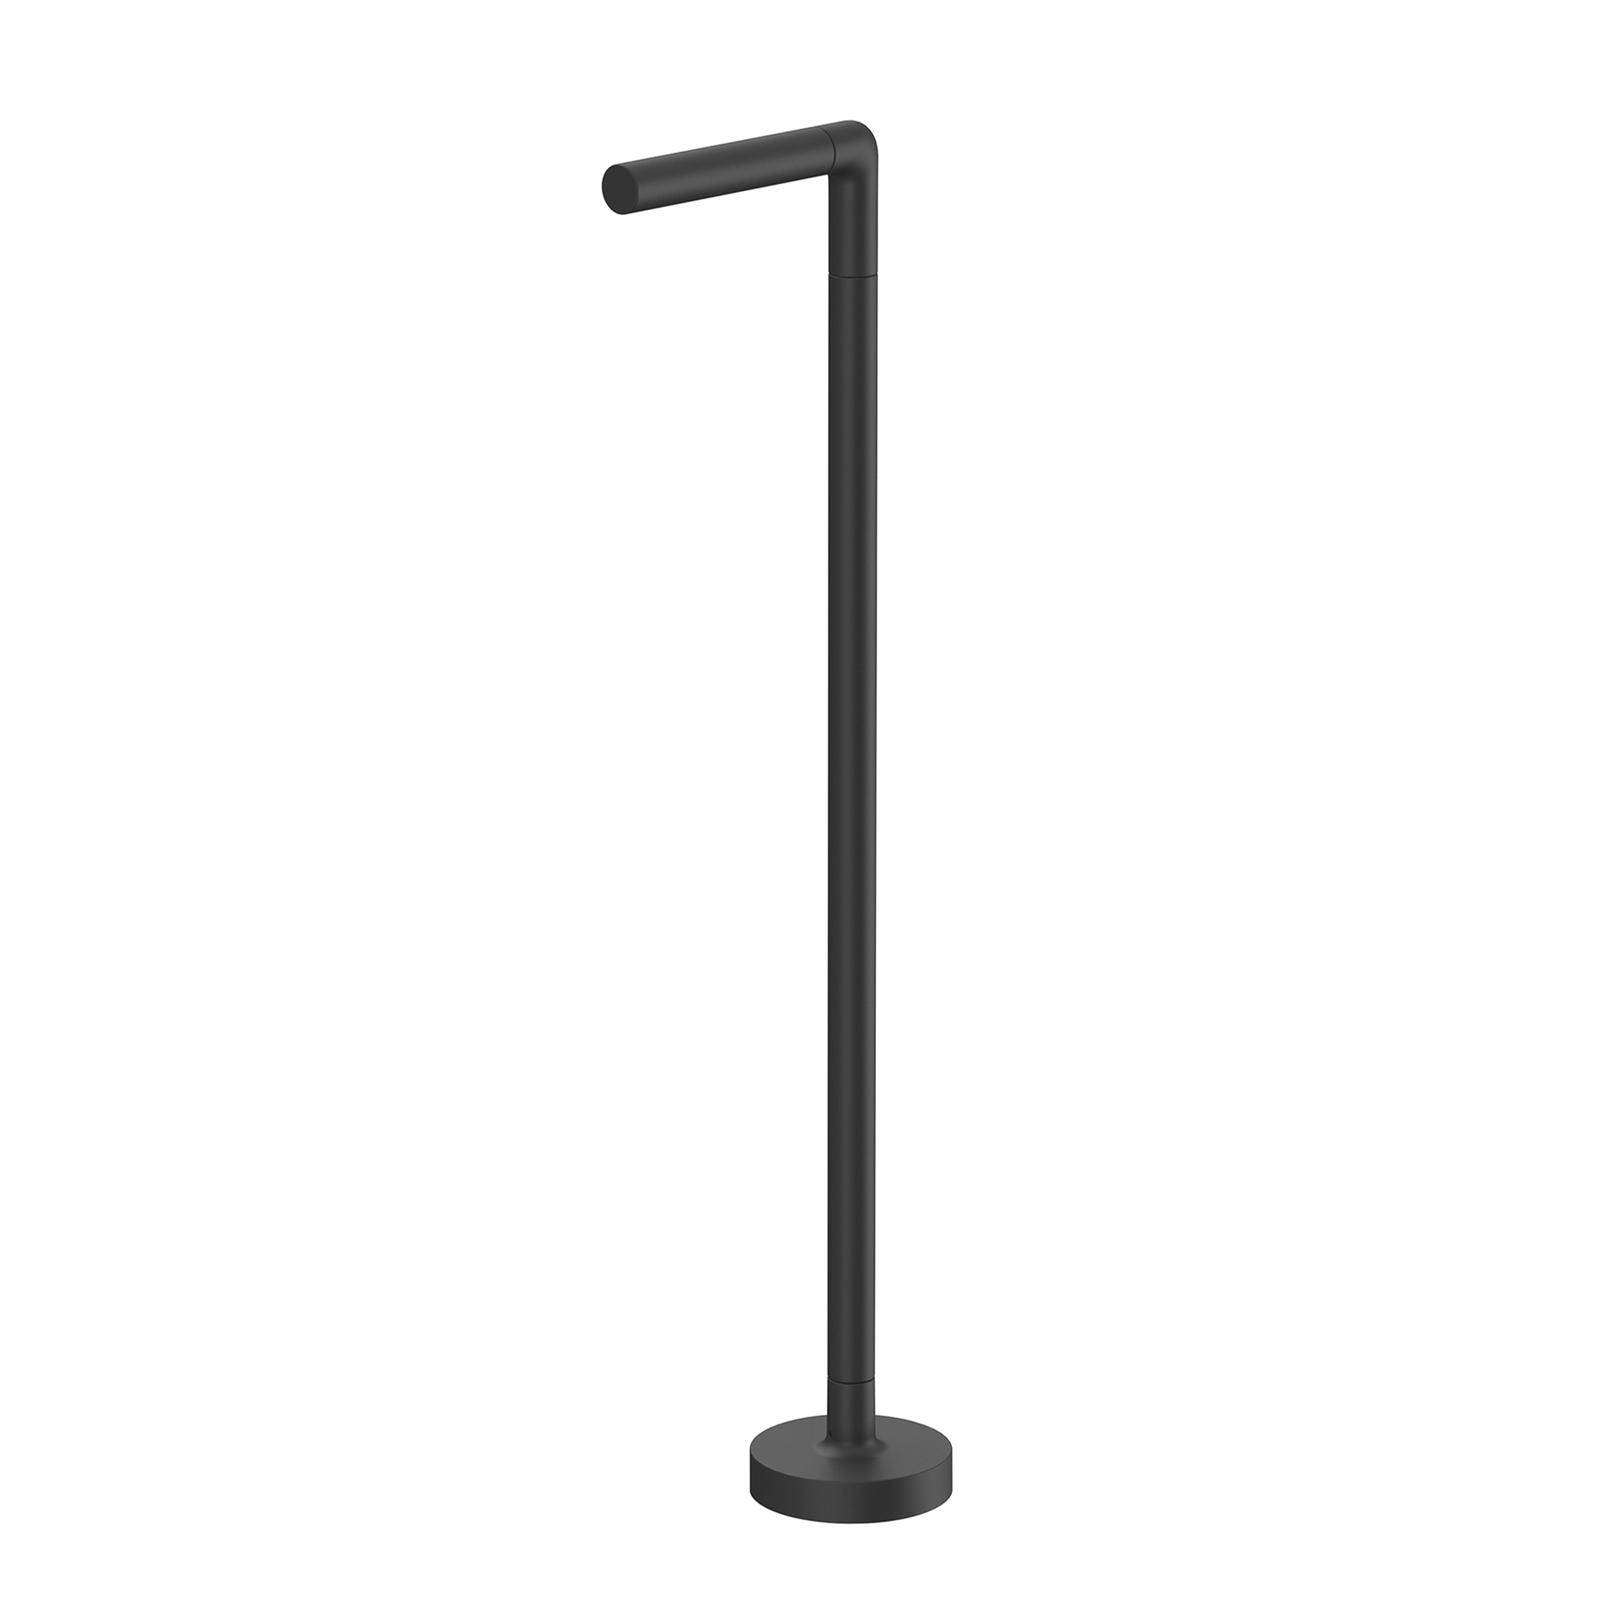 FLOS Walkstick Pipe 2 gånglampa, 2700K, svart